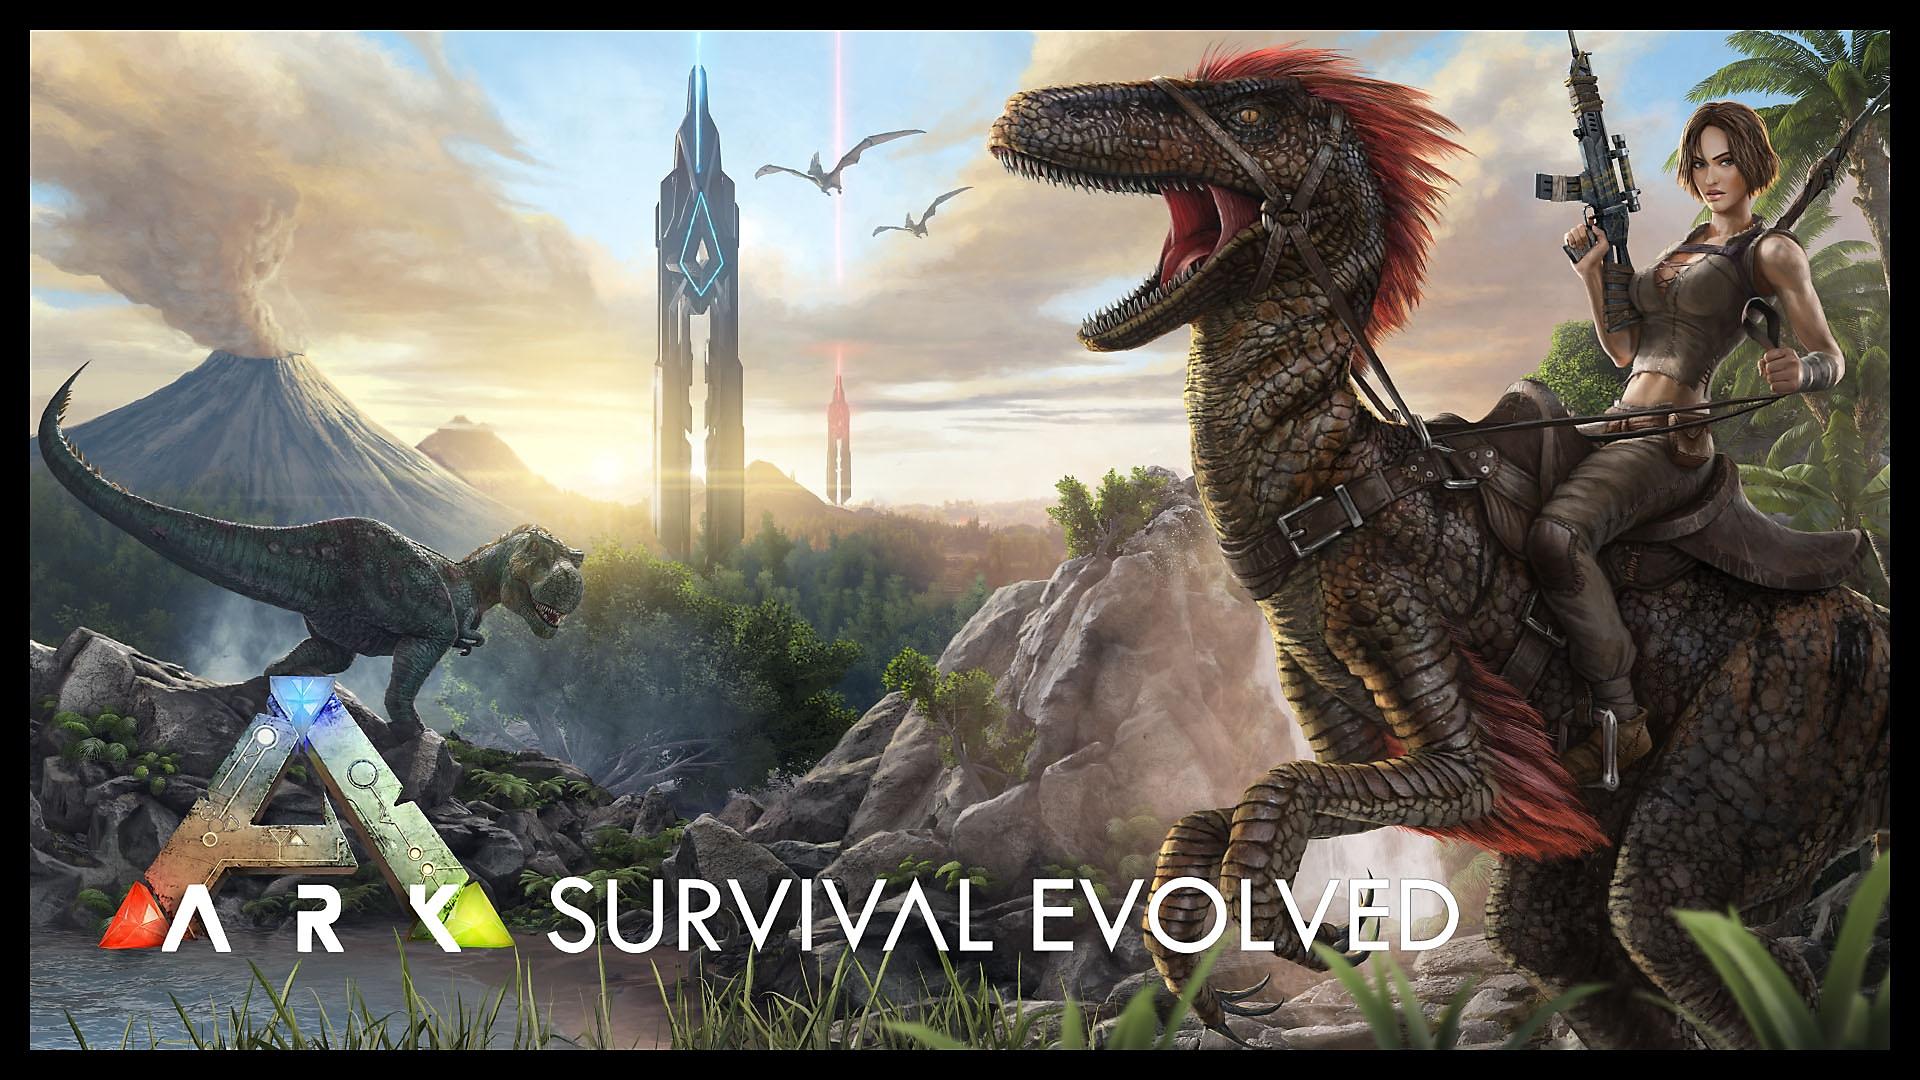 ARK: Survival Evolved - Tráiler de lanzamiento